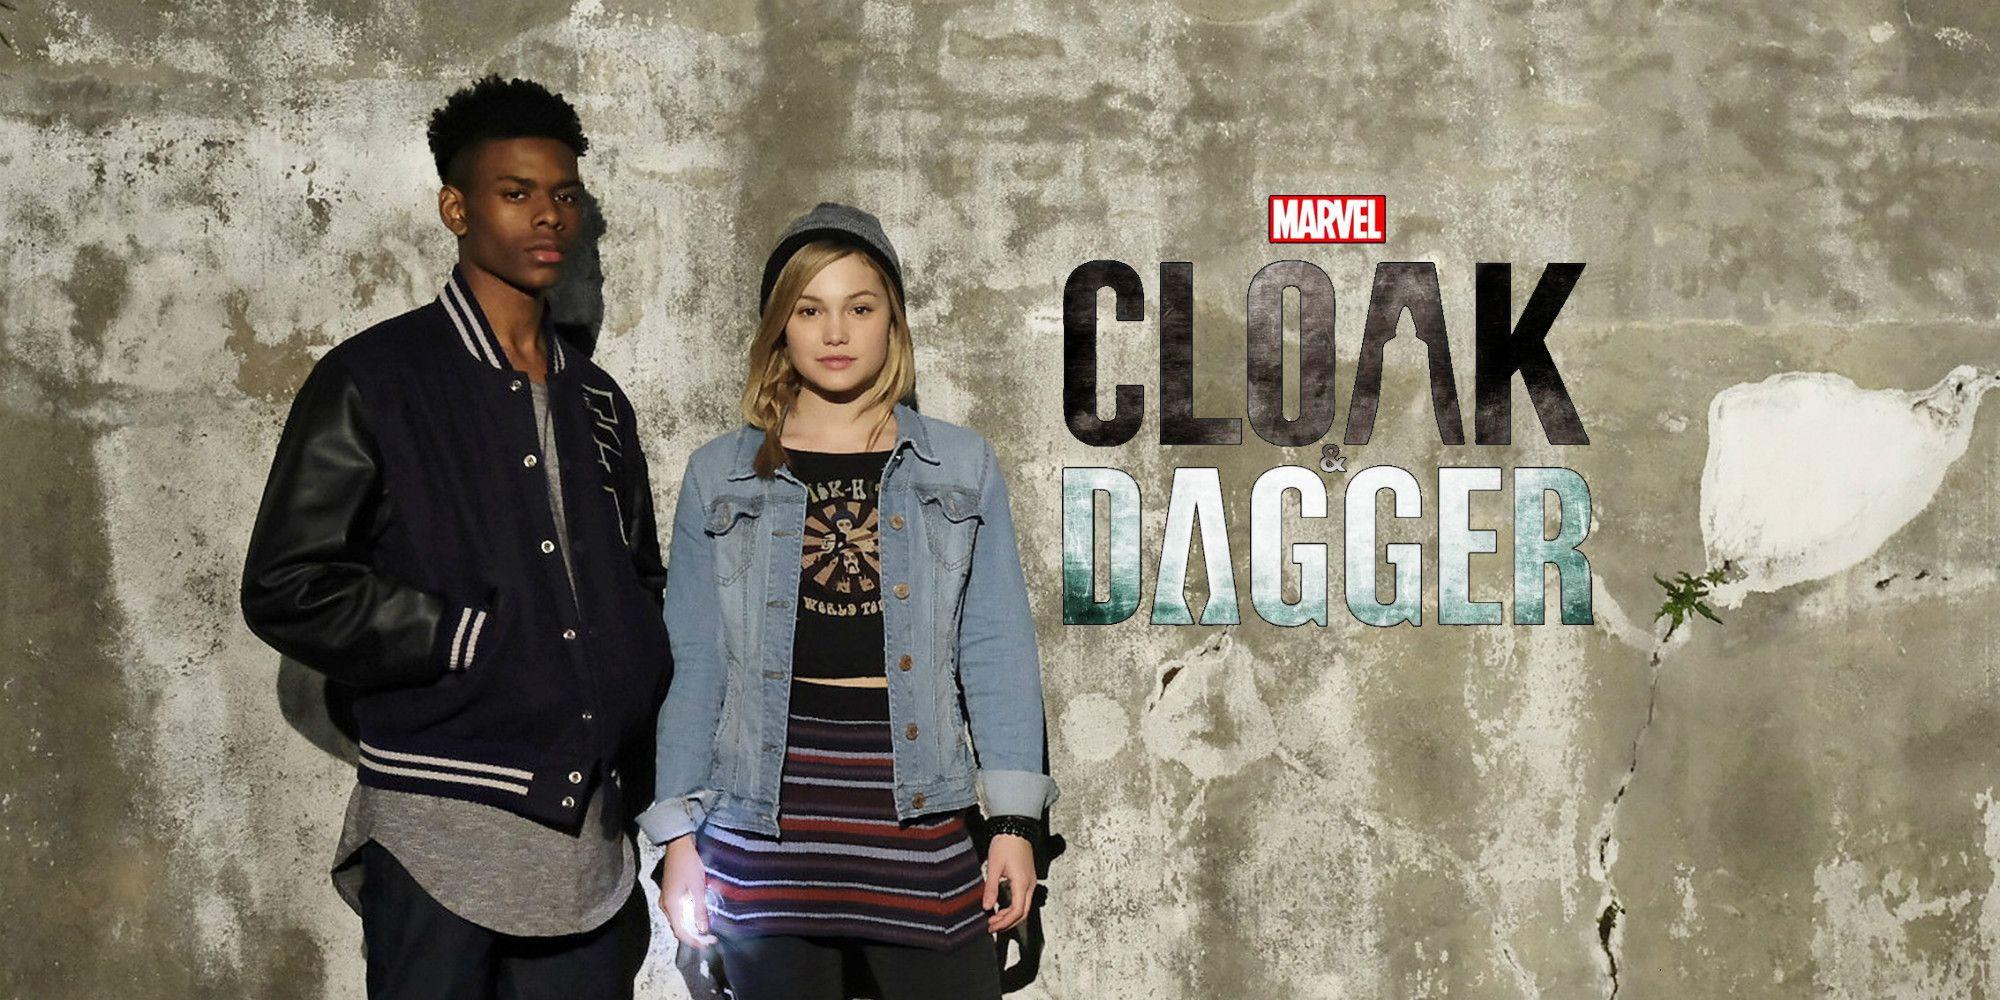 Marvels Cloak And Dagger